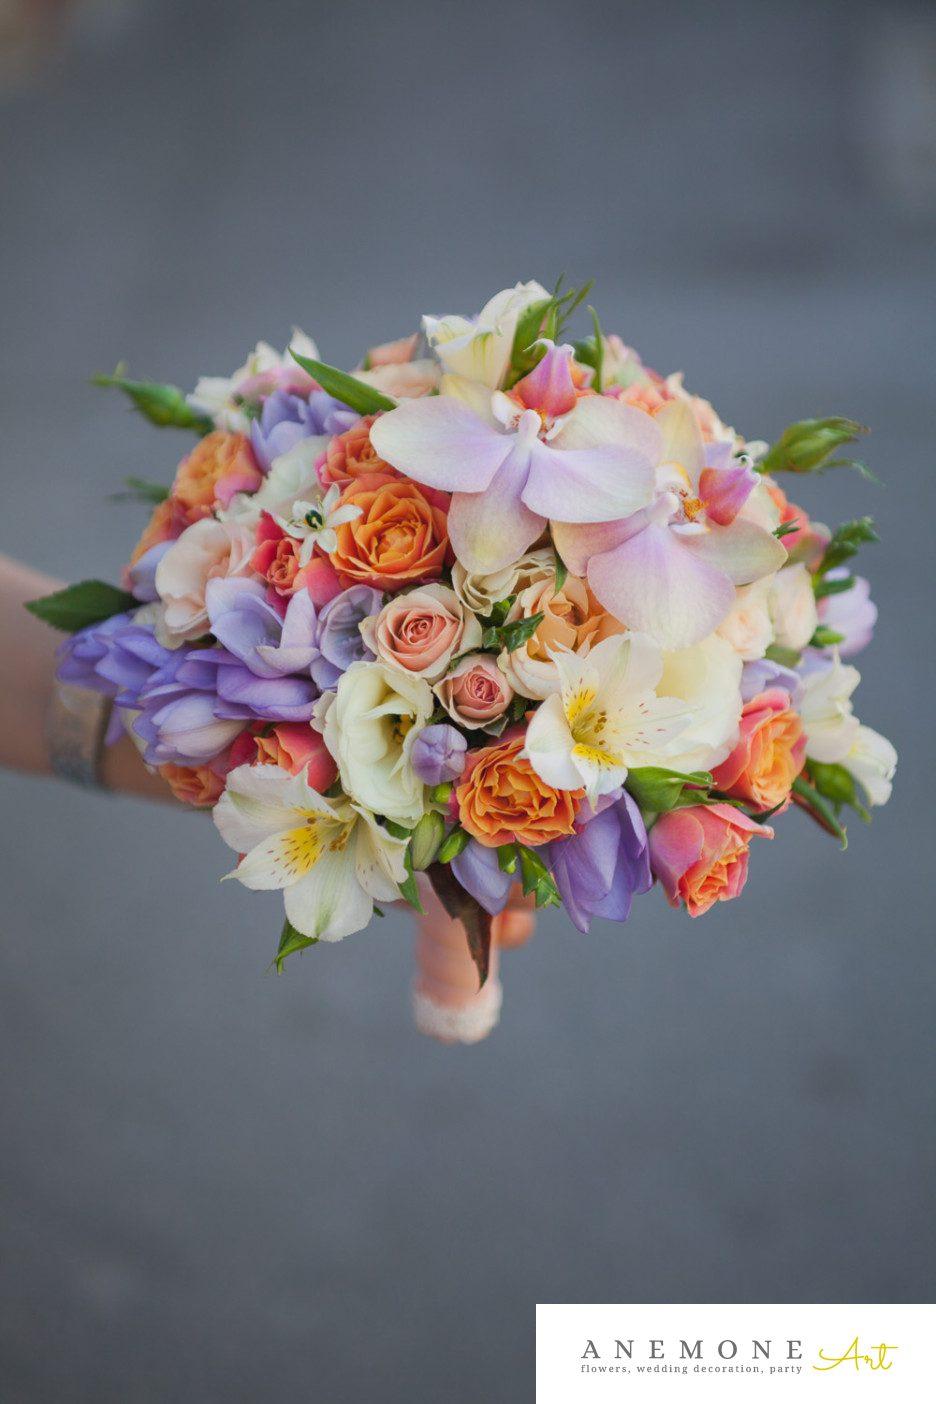 Poza, foto cu Flori de nunta alstroemeria, buchet mireasa, frezii, mini-rosa, mov, orhidee, ornitogallum, pastel, phalaenopsis, piersica, portocaliu, roz in Arad, Timisoara, Oradea (wedding flowers, bouquets) nunta Arad, Timisoara, Oradea